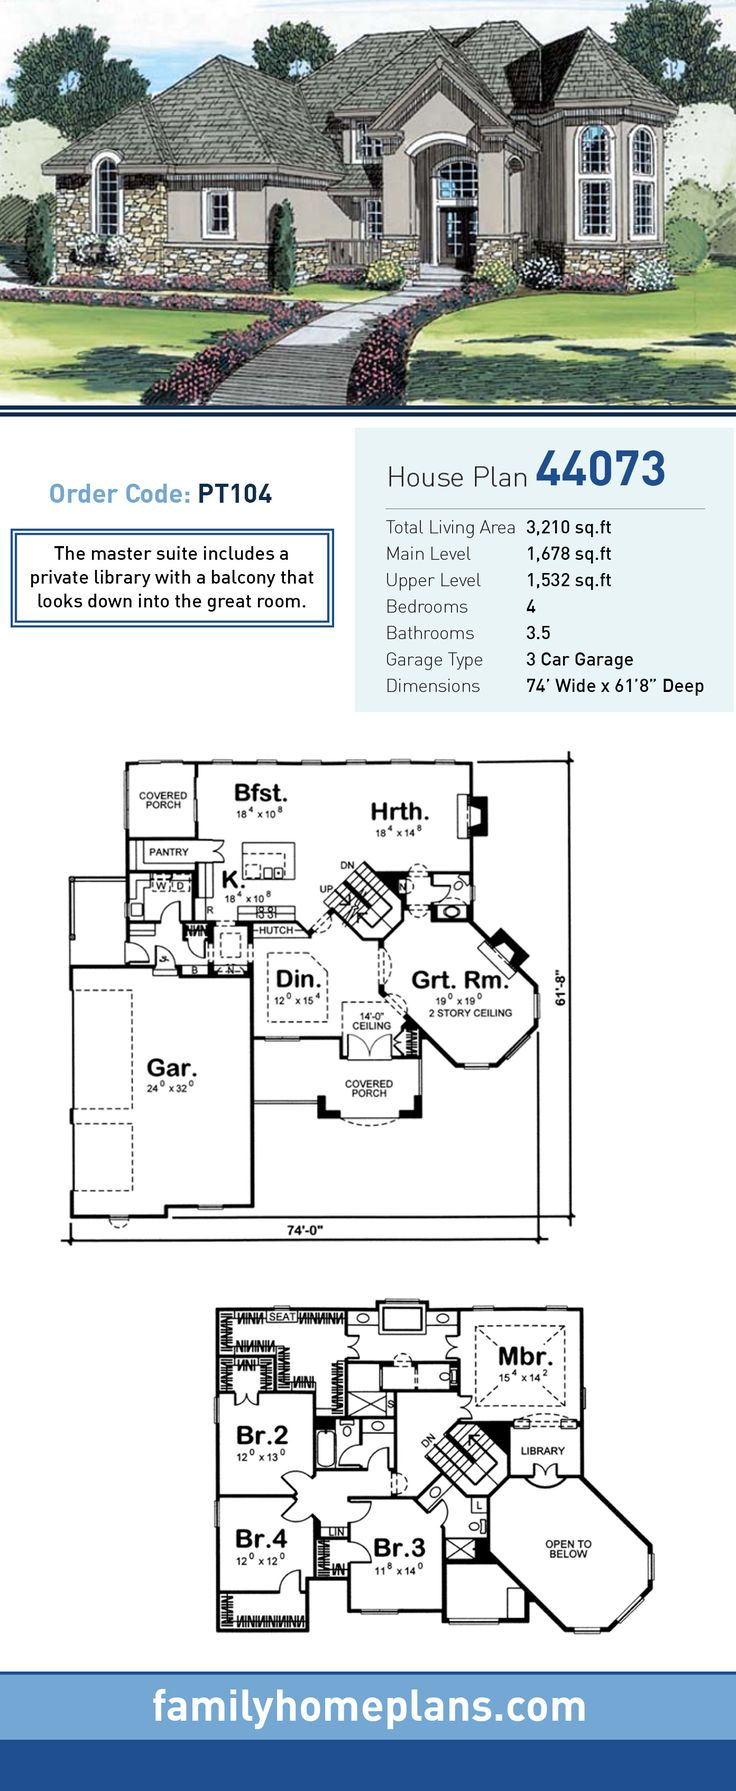 4657 best home floorplan images on pinterest house floor plans european house plan 44073